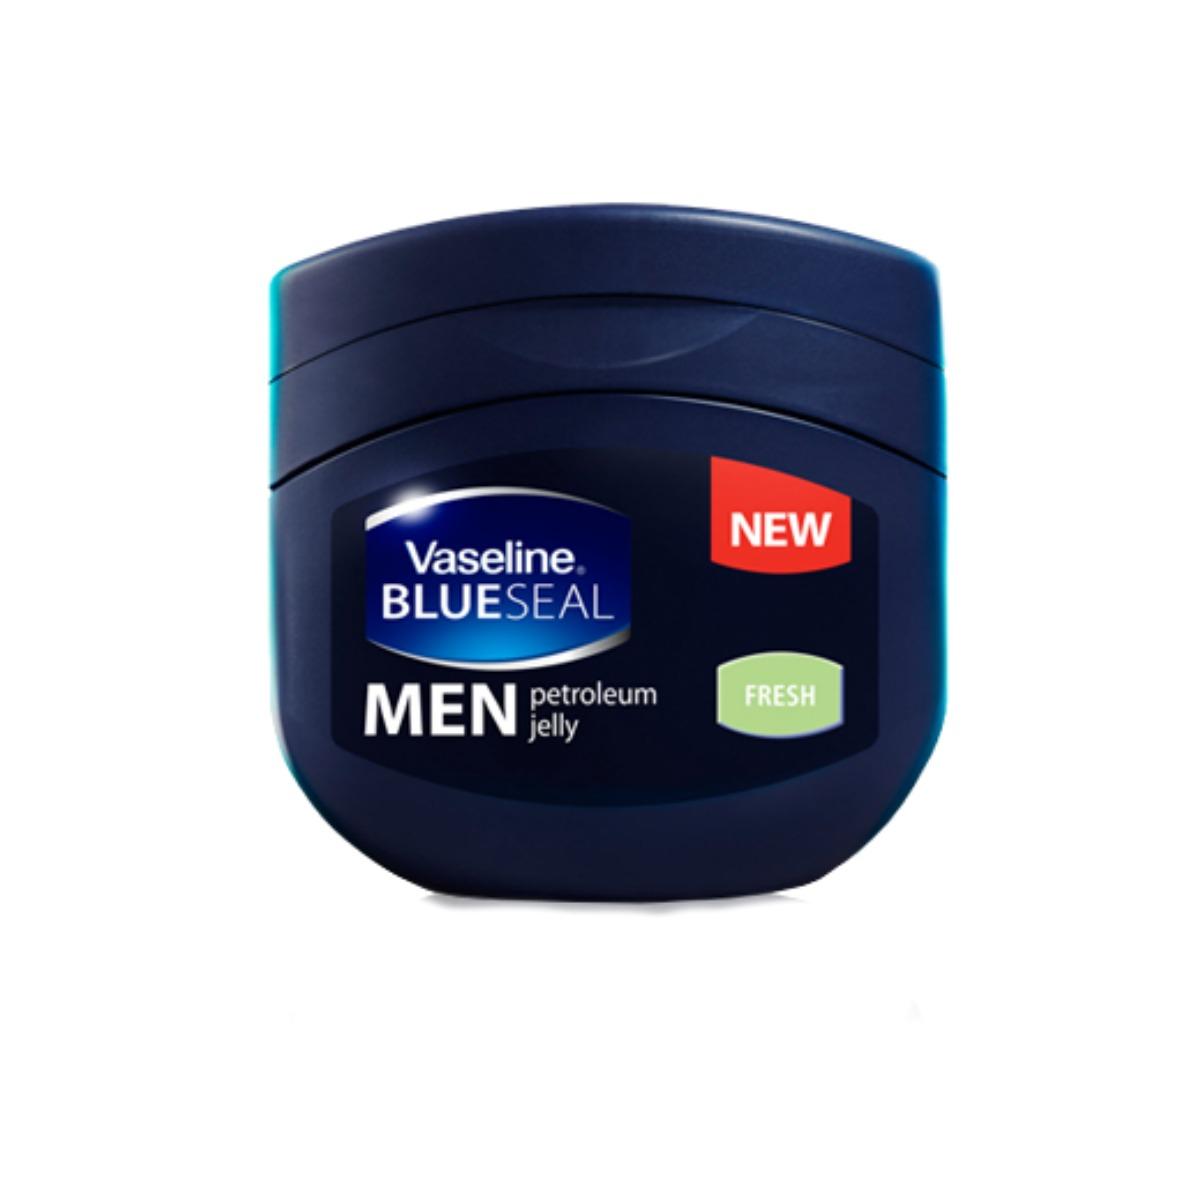 Vaseline Blueseal Men Petroleum Jelly Fresh 100ml